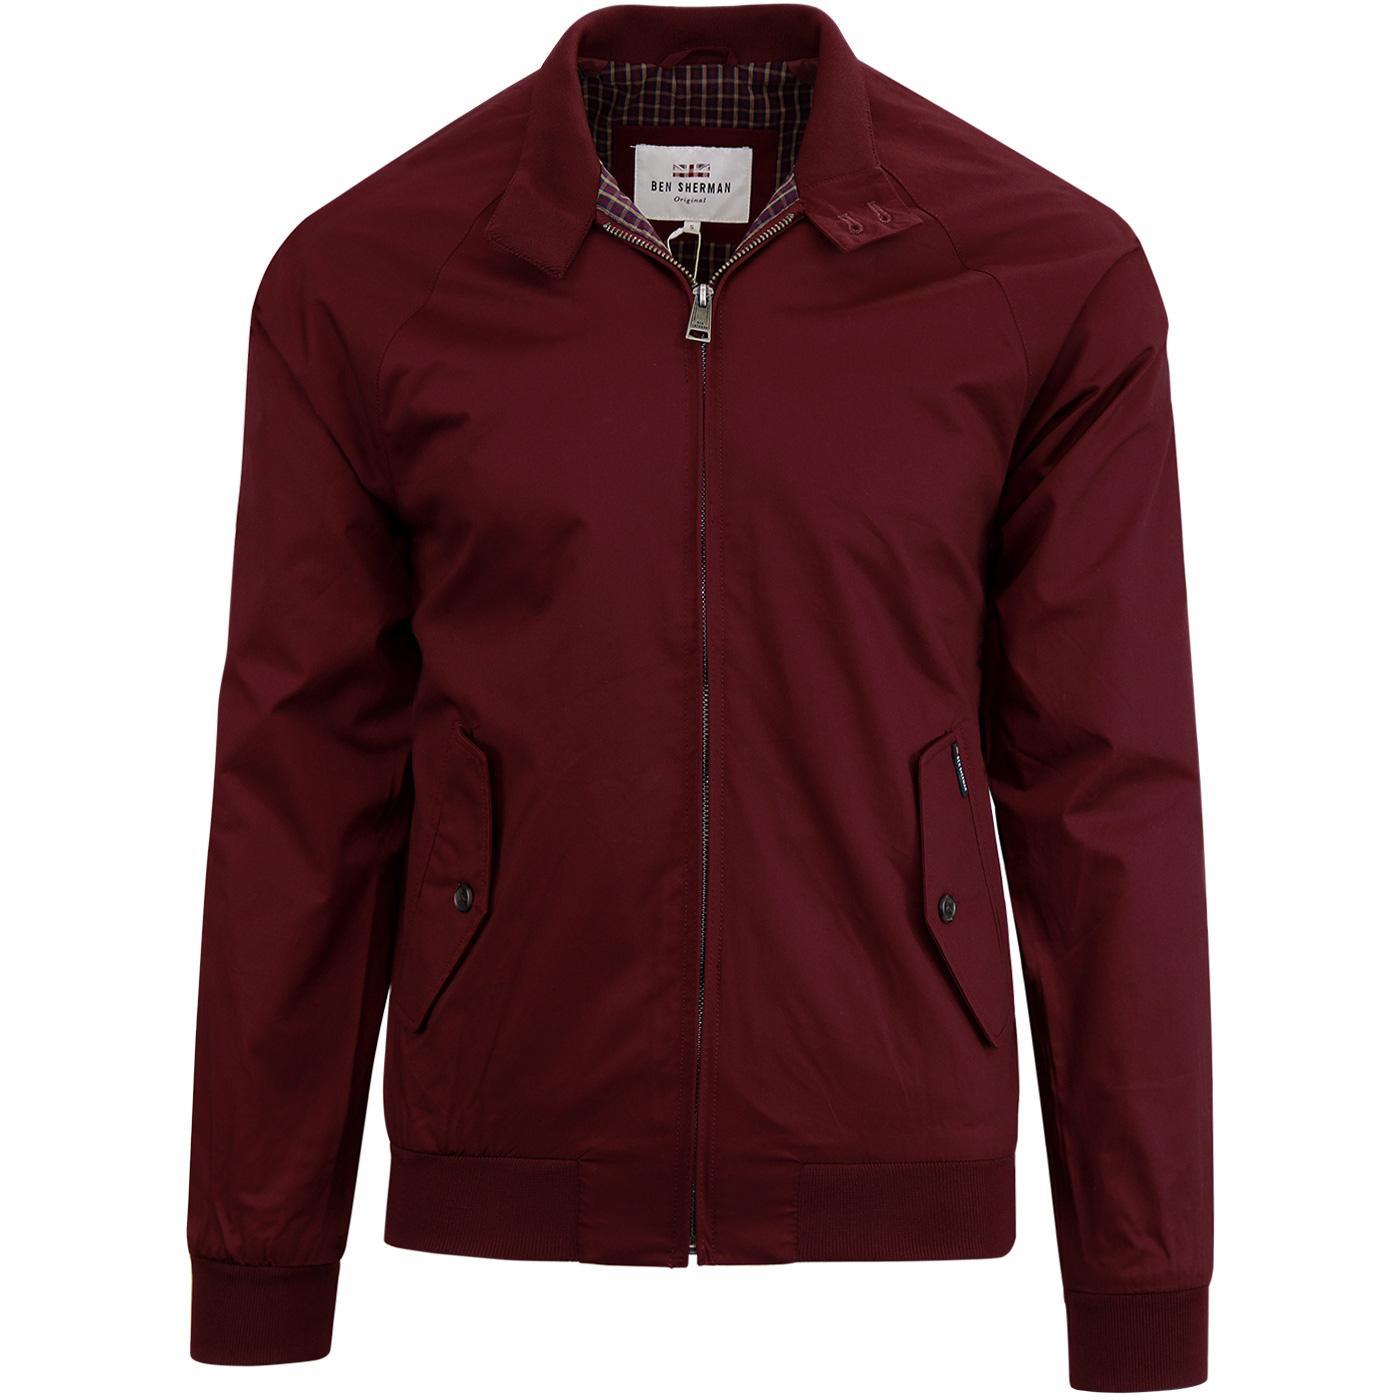 BEN SHERMAN Retro Mod Harrington Jacket (Port)